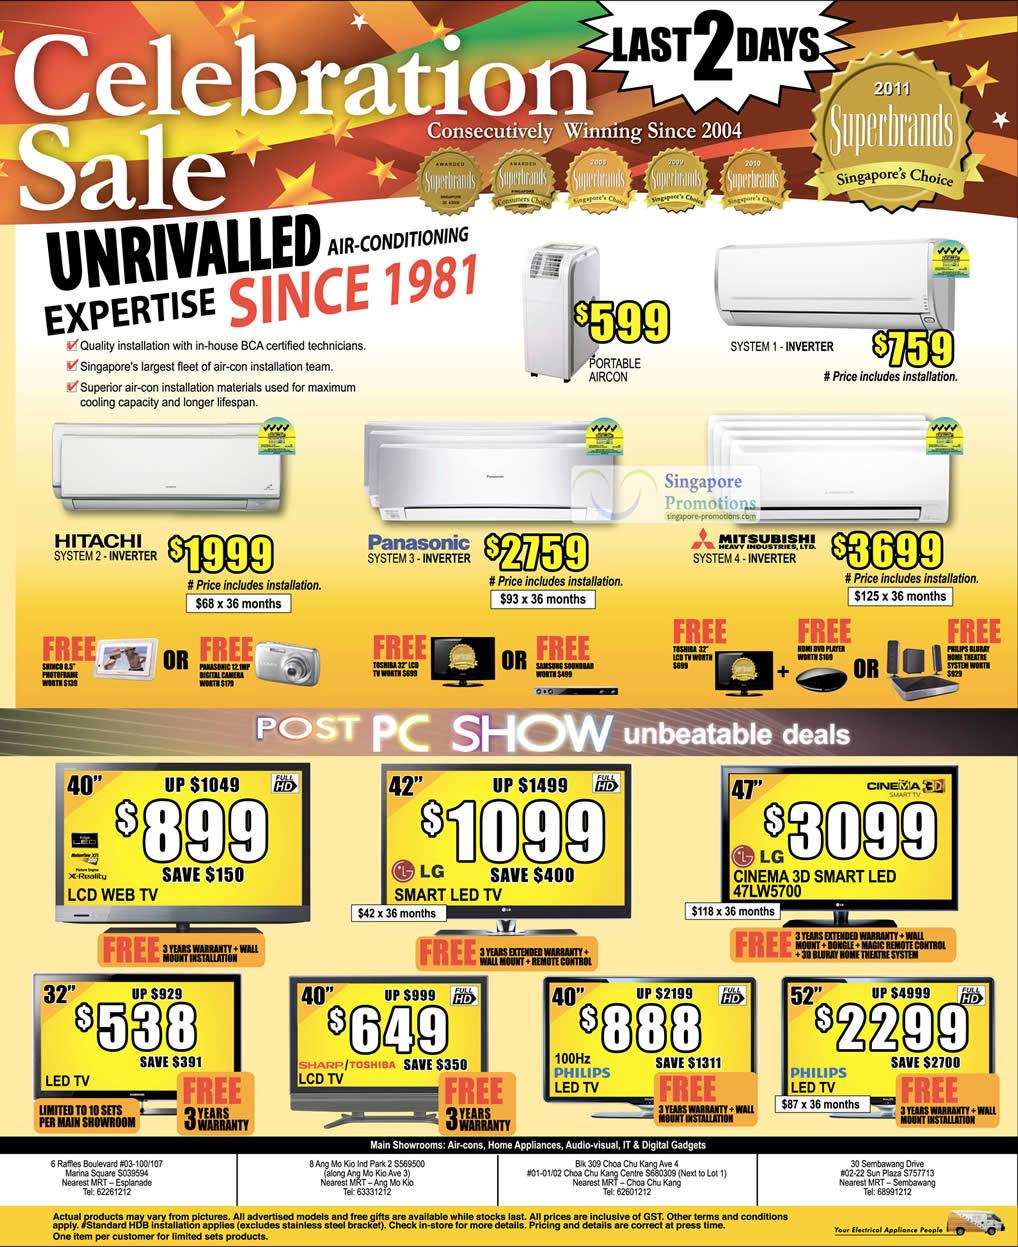 Air Conditioner, Hitachi, Panasonic, Mitsubishi, System 2 3 4, Inverter, TV, LCD, LED, Toshiba, Philips, Sharp, LG 47LW5700